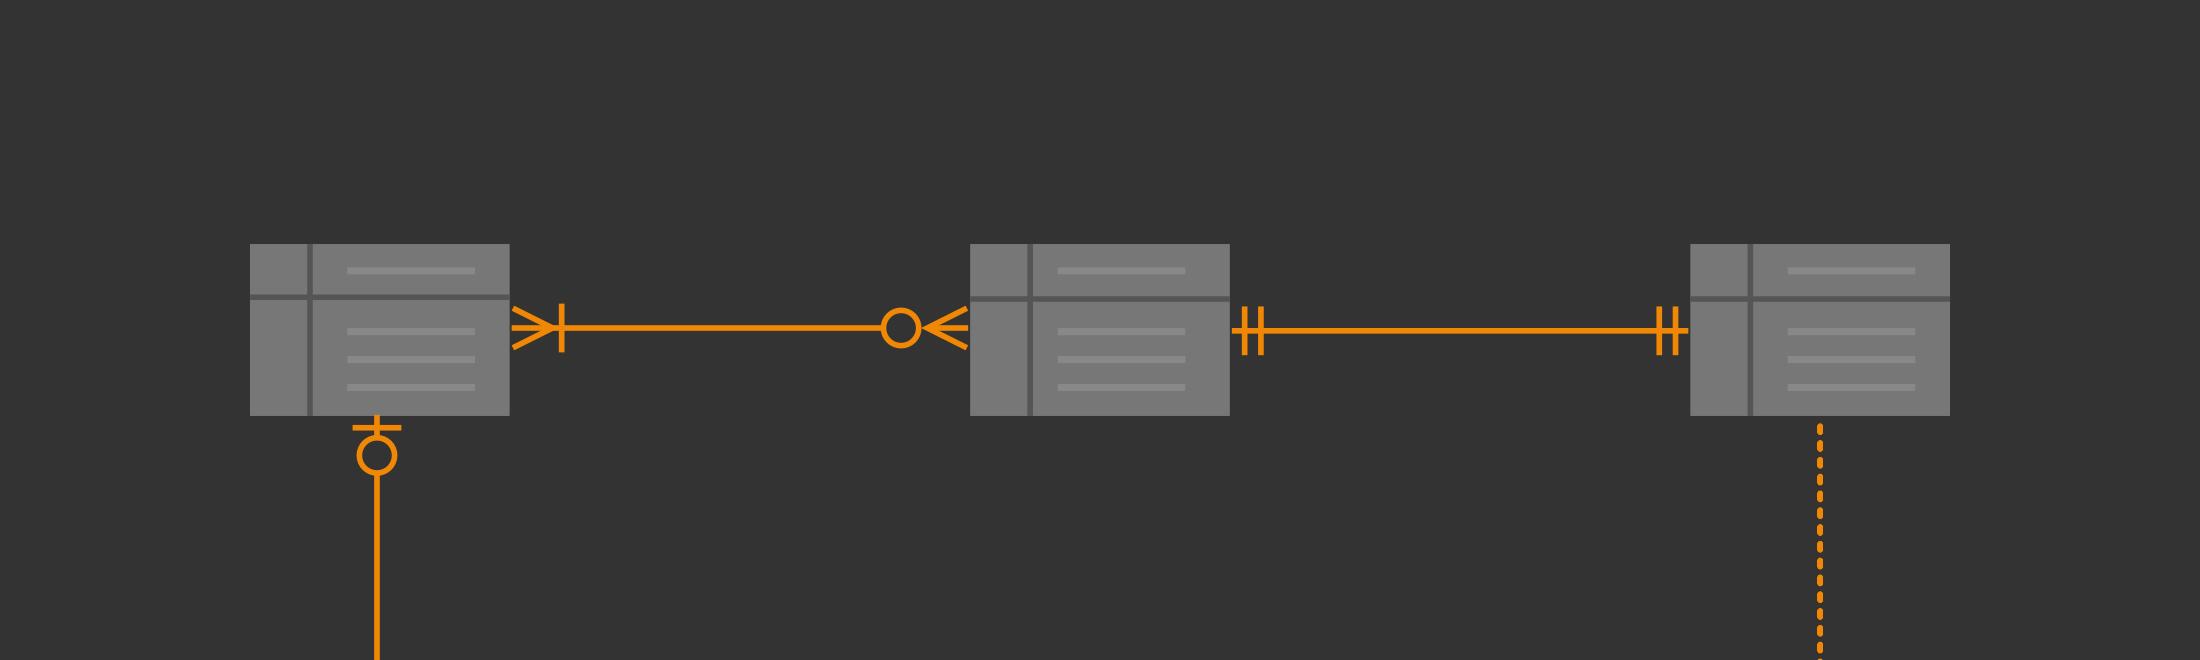 Entity Relationship Diagrams With Draw.io – Draw.io pertaining to Entity Relationship Diagram Connectors